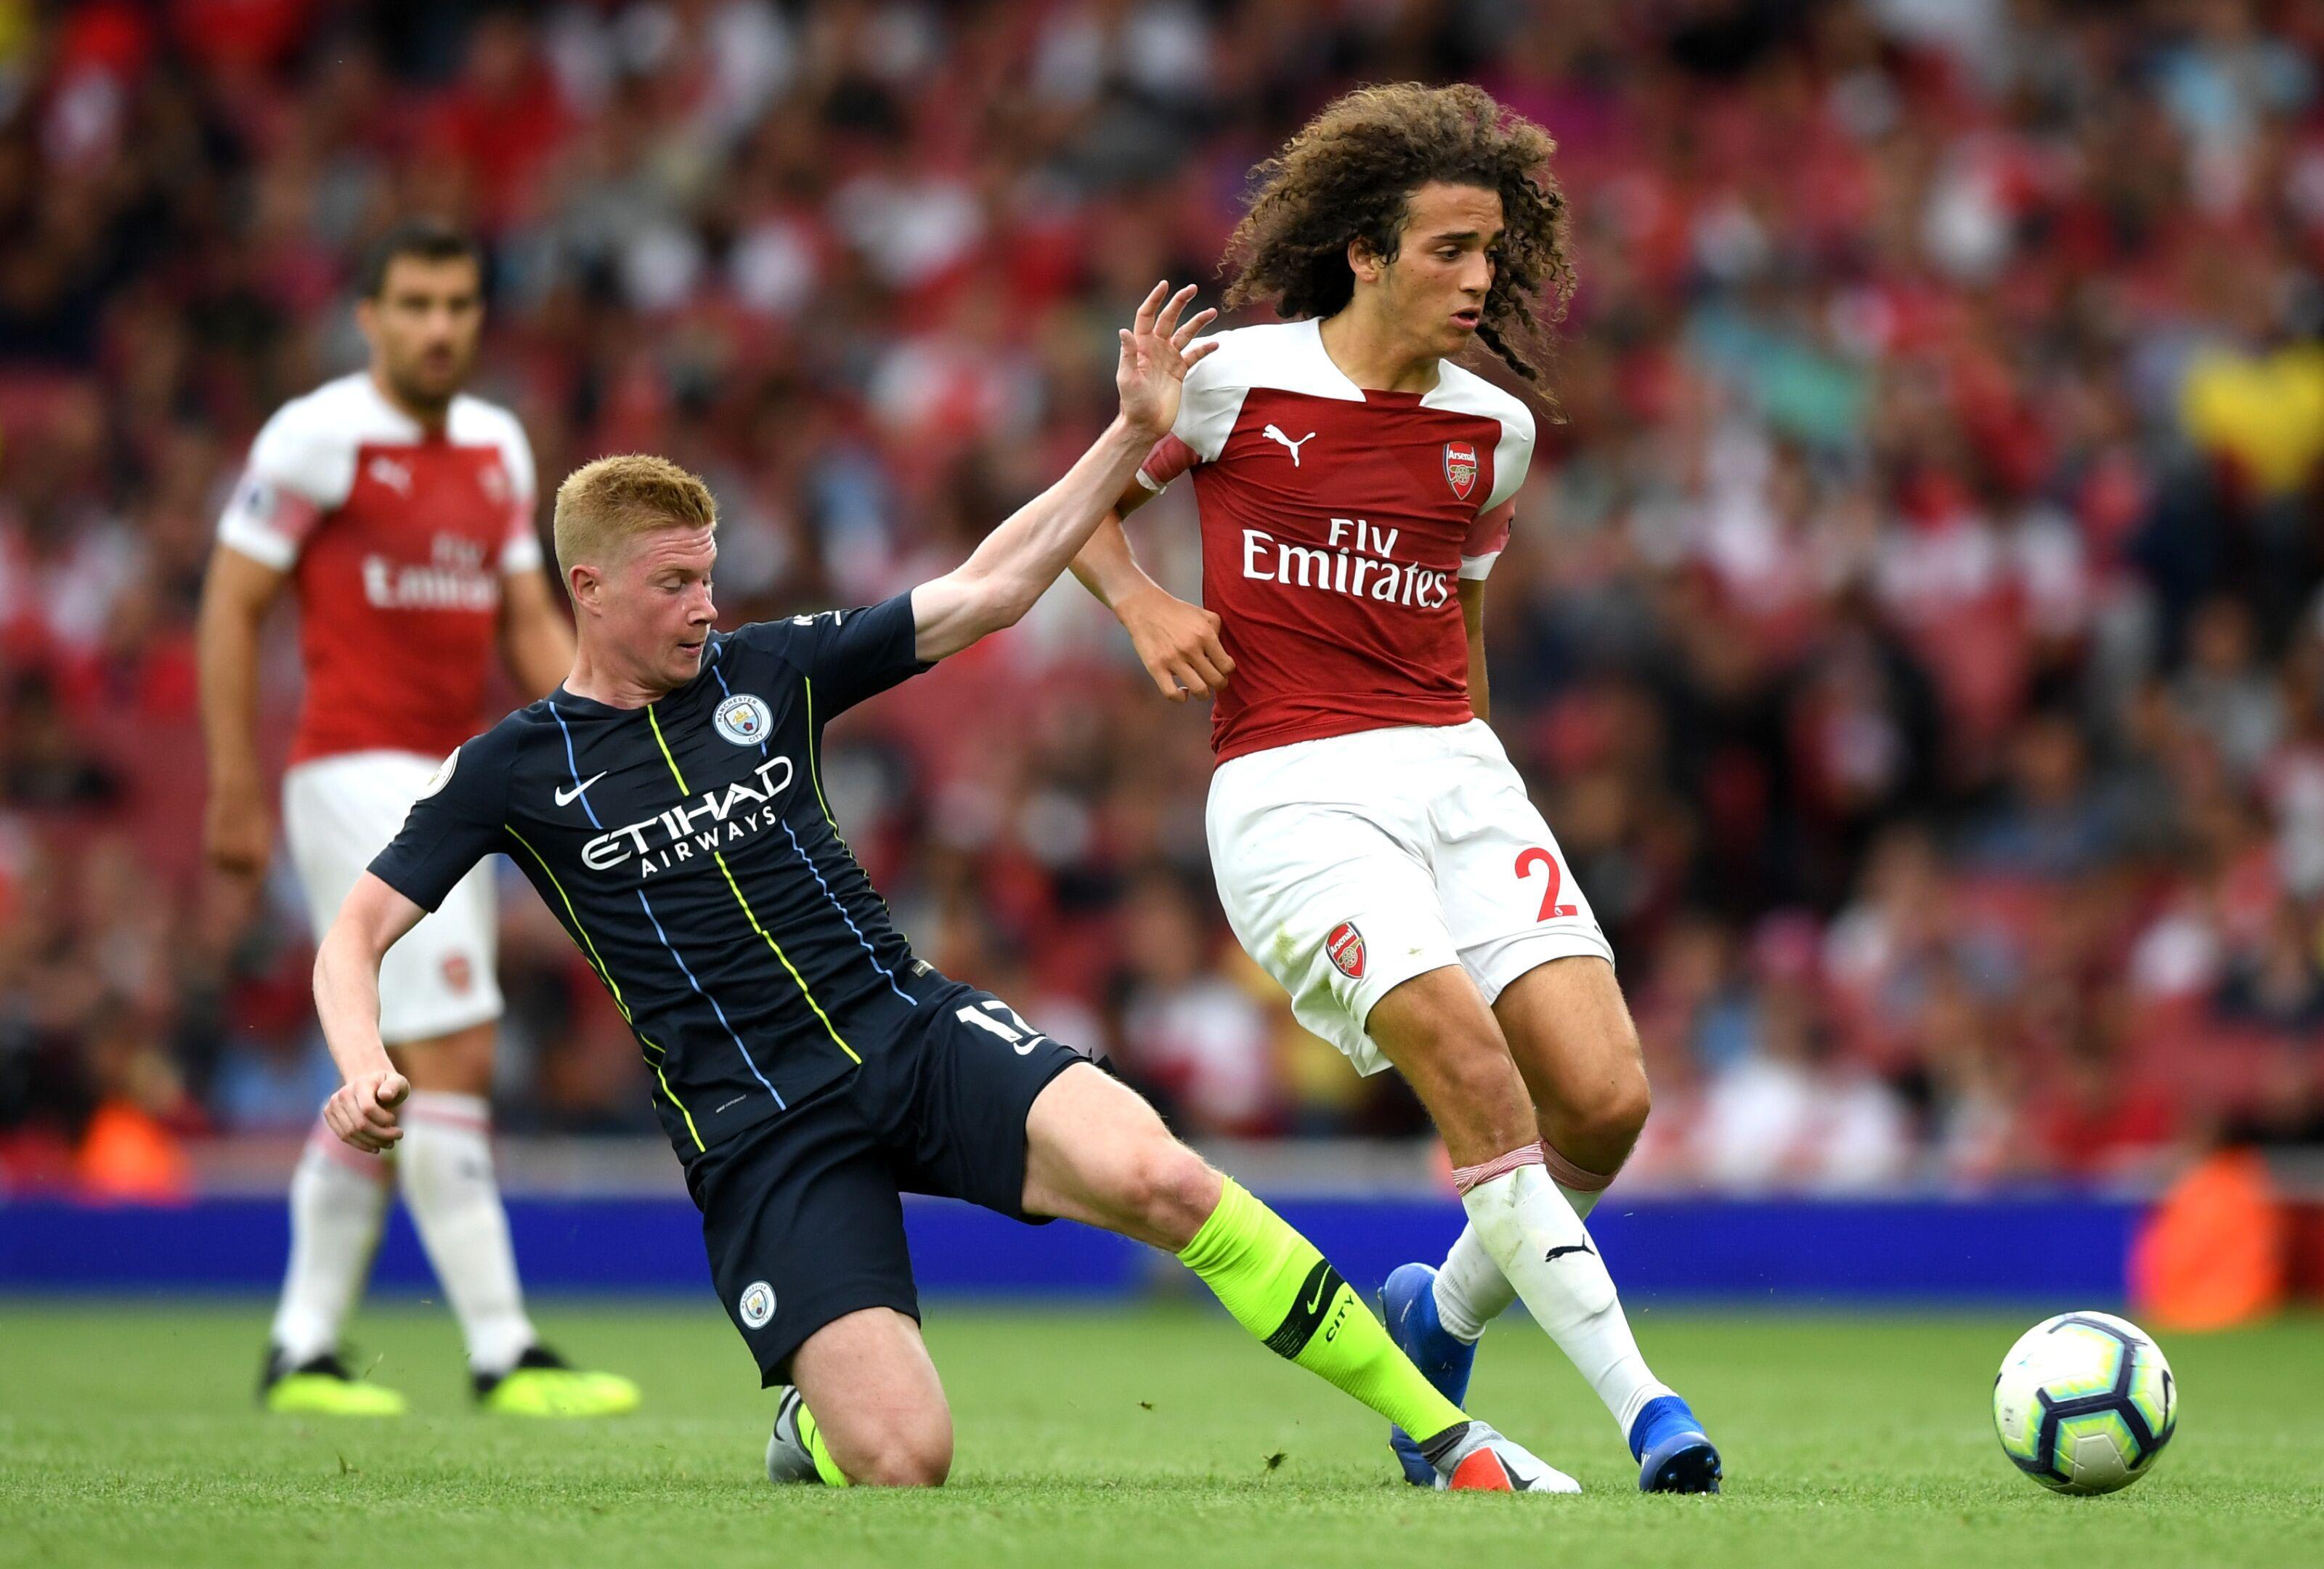 42bcb90ab659 Arsenal analysis: Matteo Guendouzi isn't fit to fill Aaron Ramsey's boots